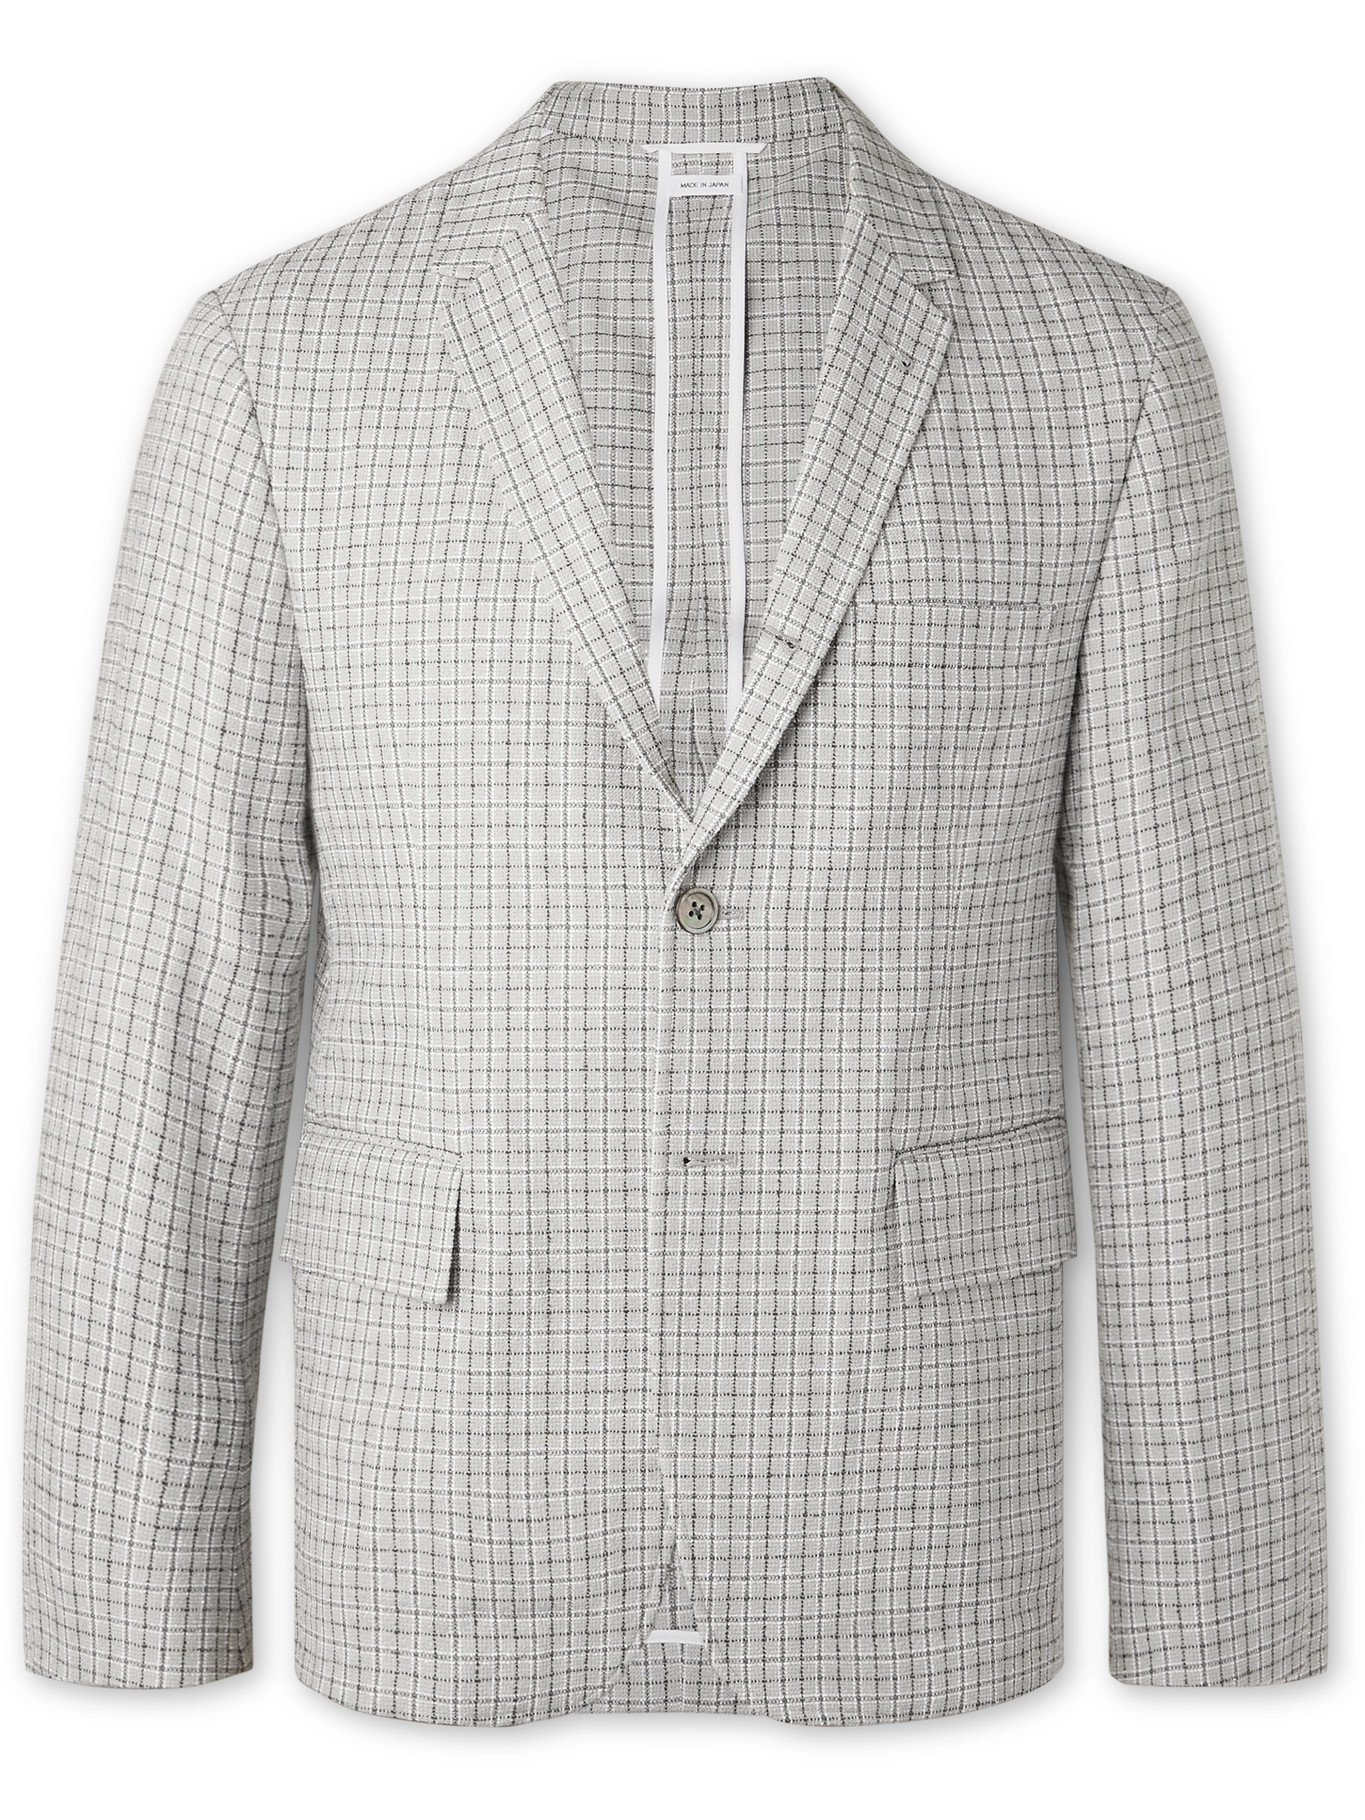 Photo: THOM BROWNE - Slim-Fit Unstructured Checked Cotton-Blend Bouclé Blazer - Gray - 1